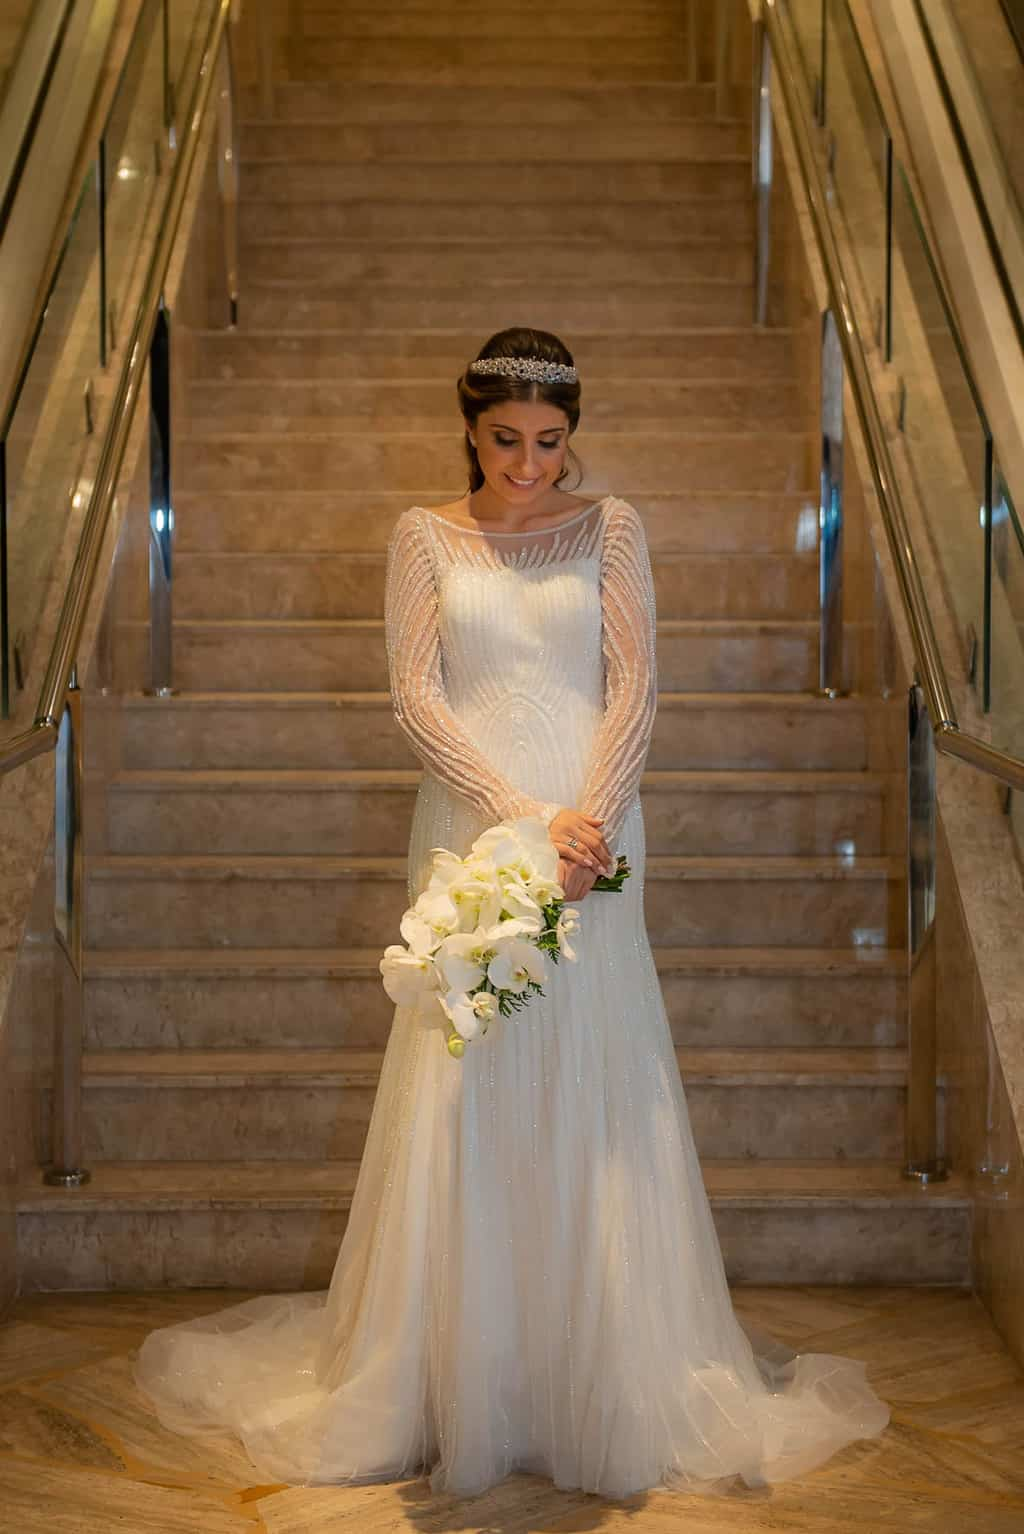 buque-casamento-luiza-e-gustavo-cerimonial-casamento-de-ideias-fotografia-lenine-serejo-making-of-vestido-de-noiva12